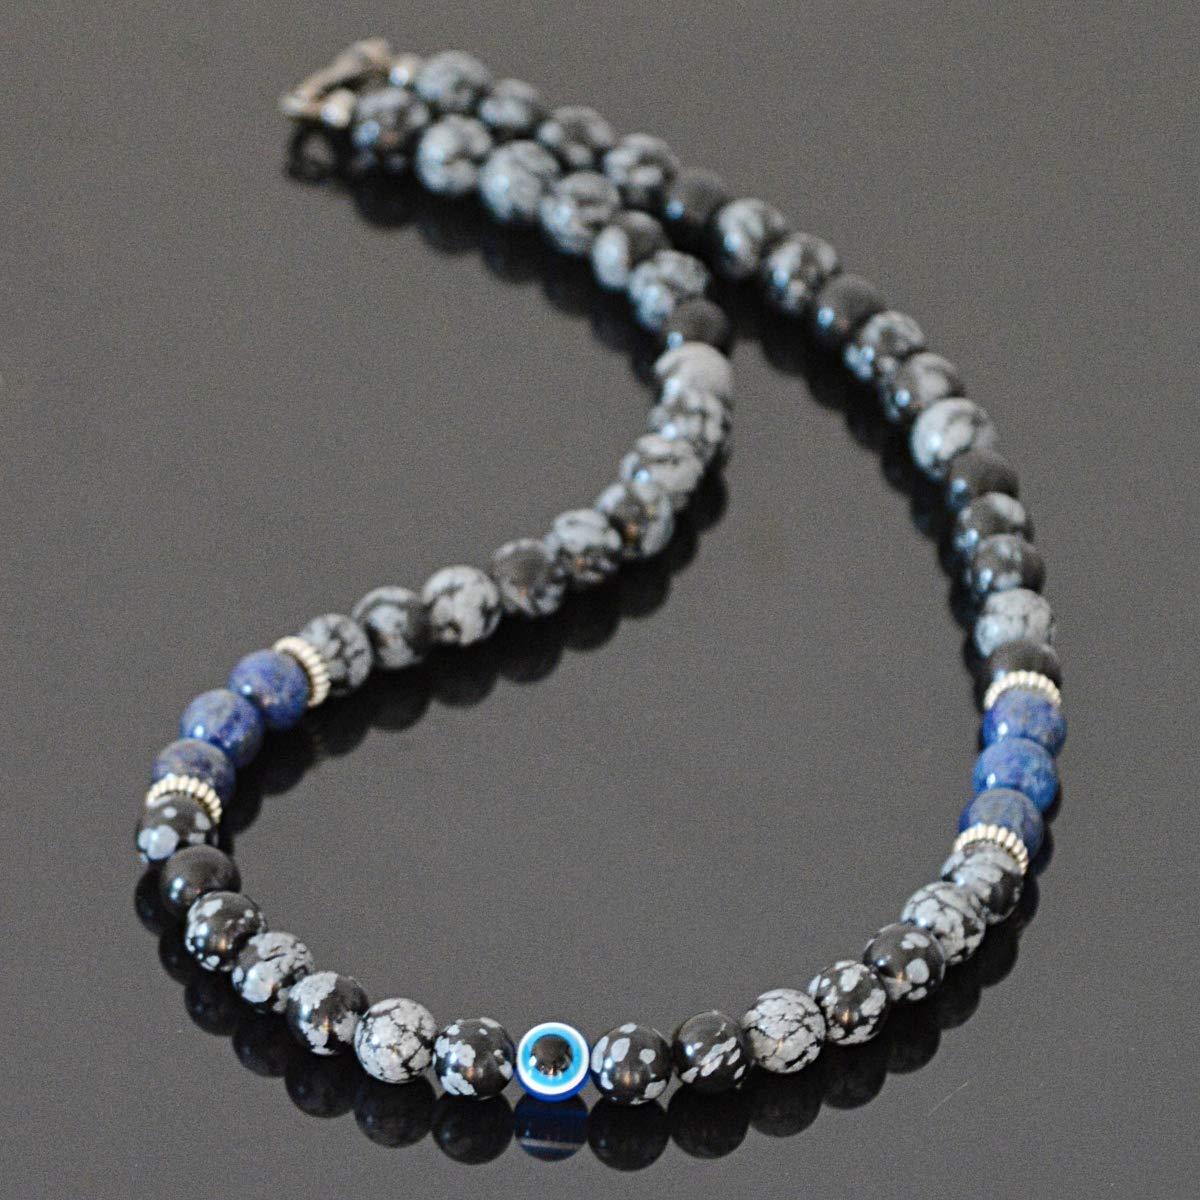 Handmade Lapis Lazuli Gemstone Point Necklace Choker